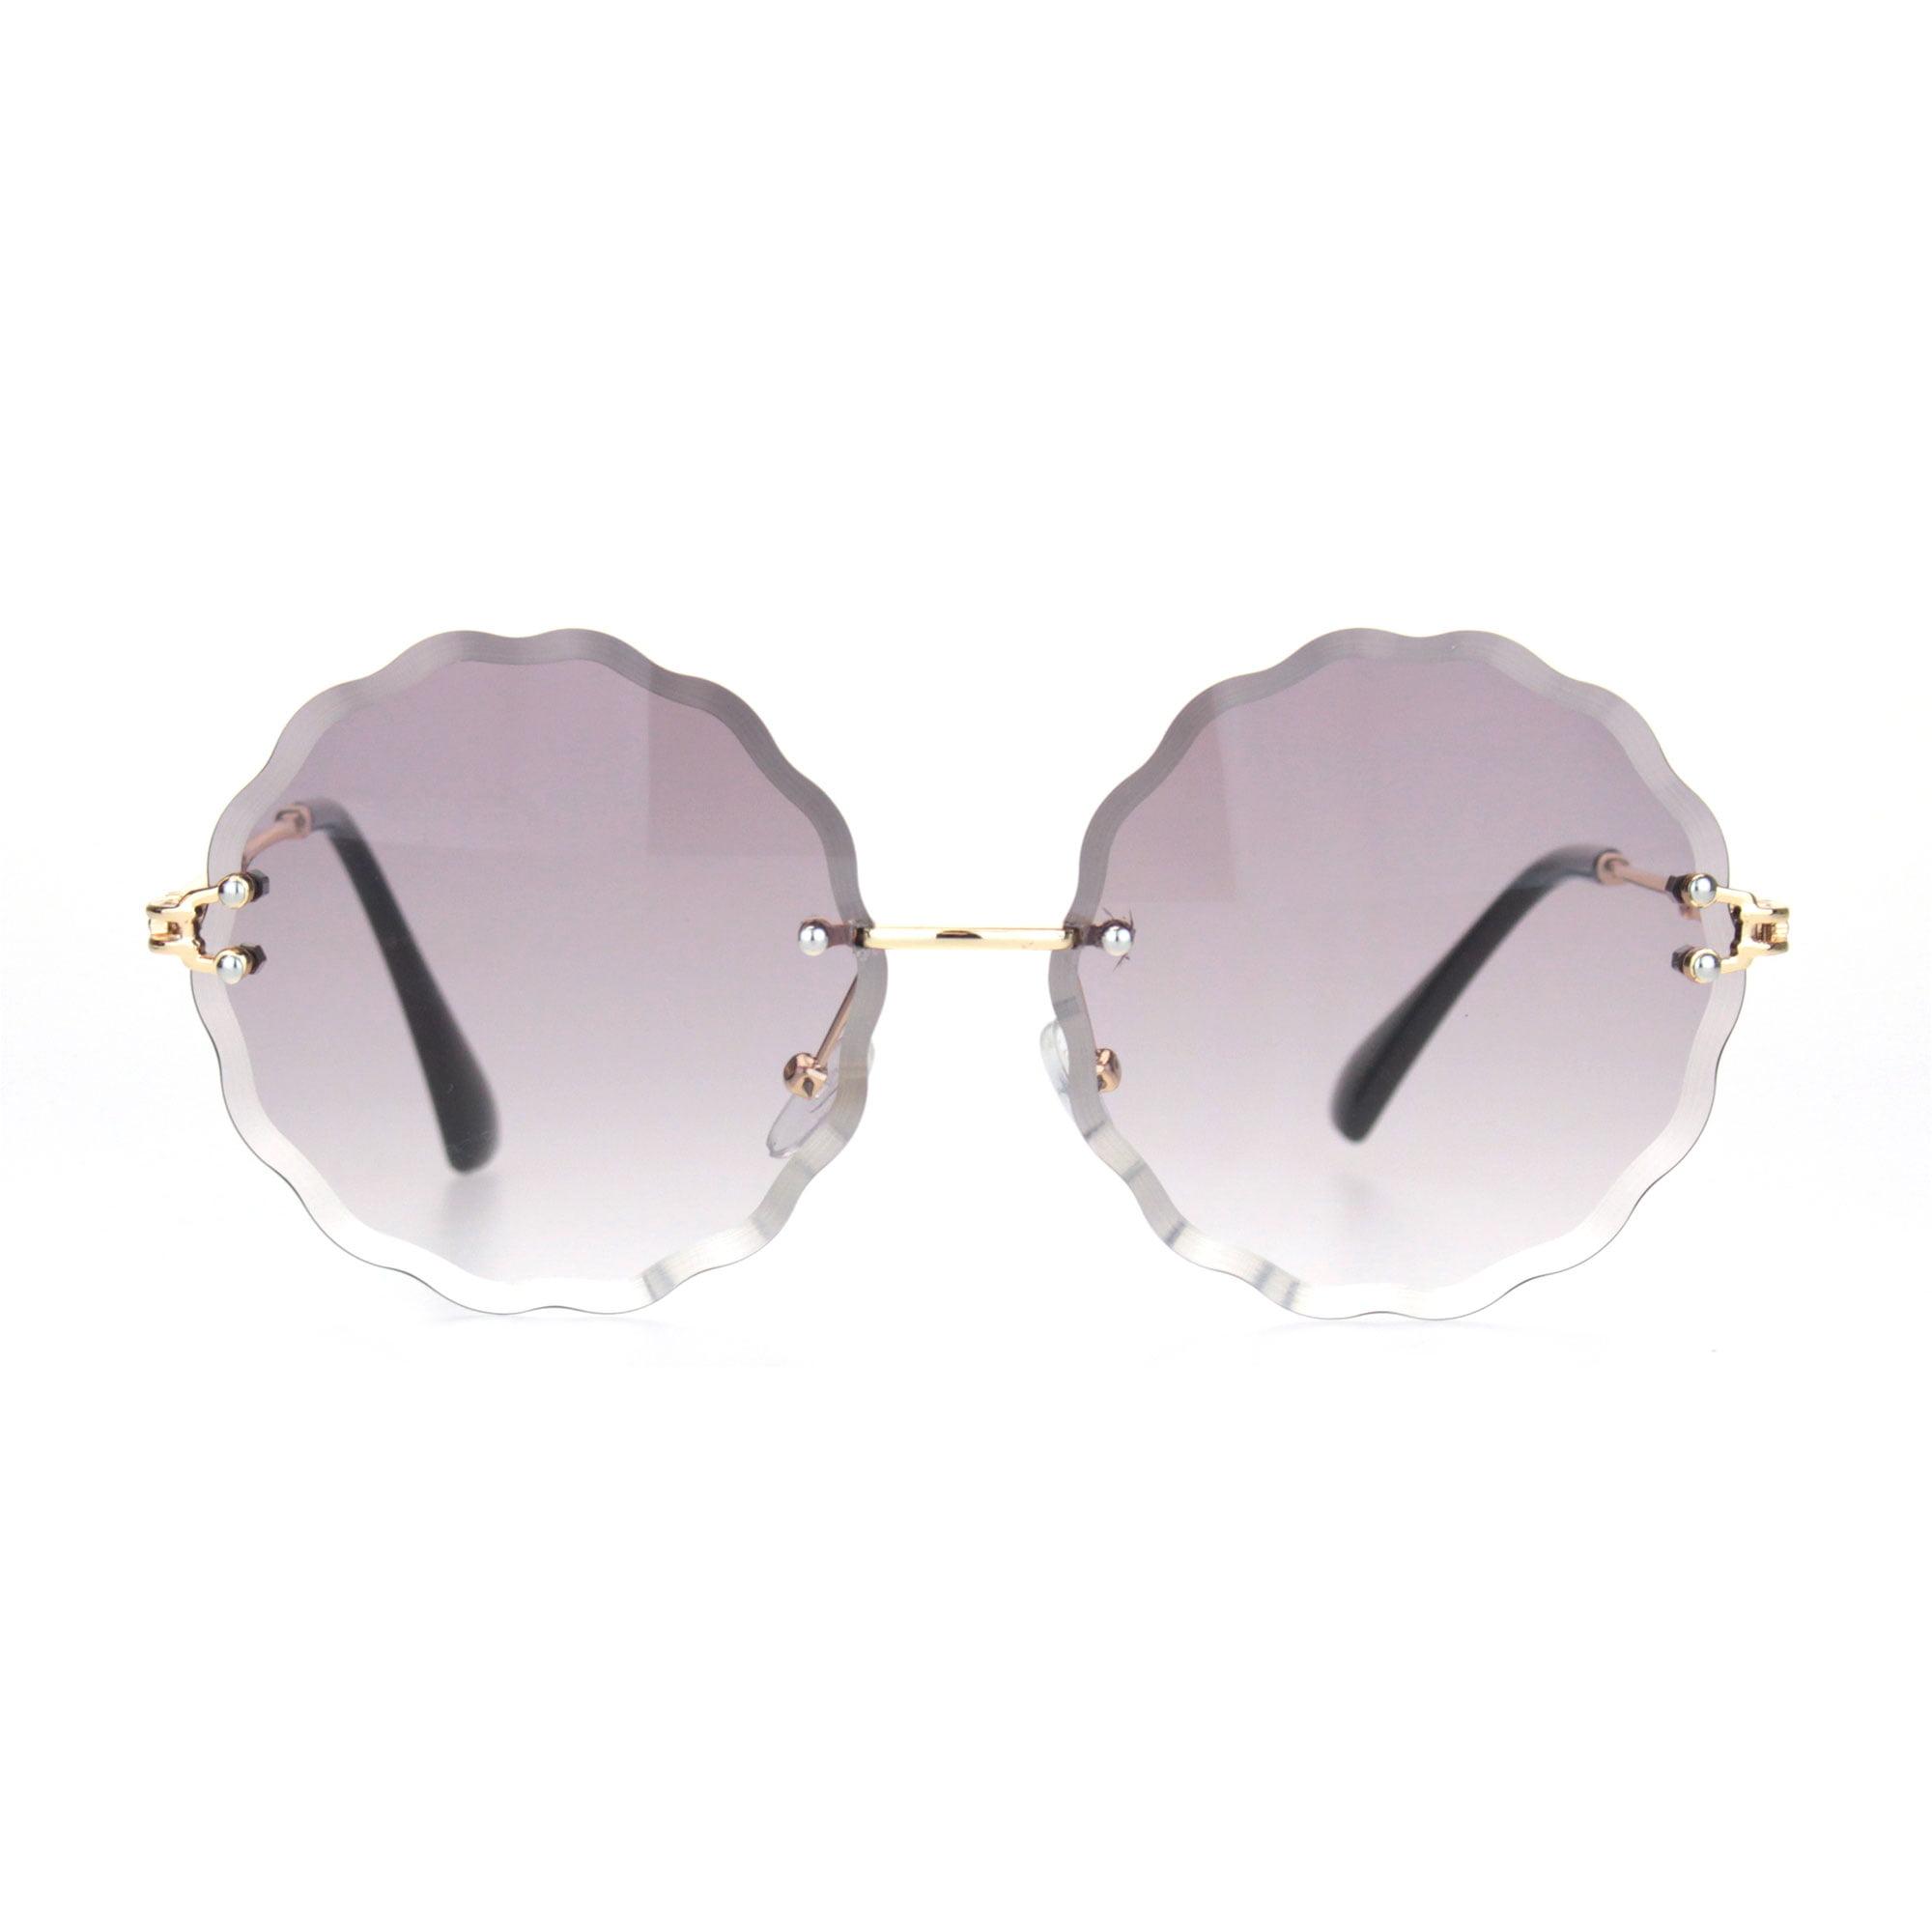 Beveled Cut Flower Petal Lens Rimless Round Retro Sunglasses